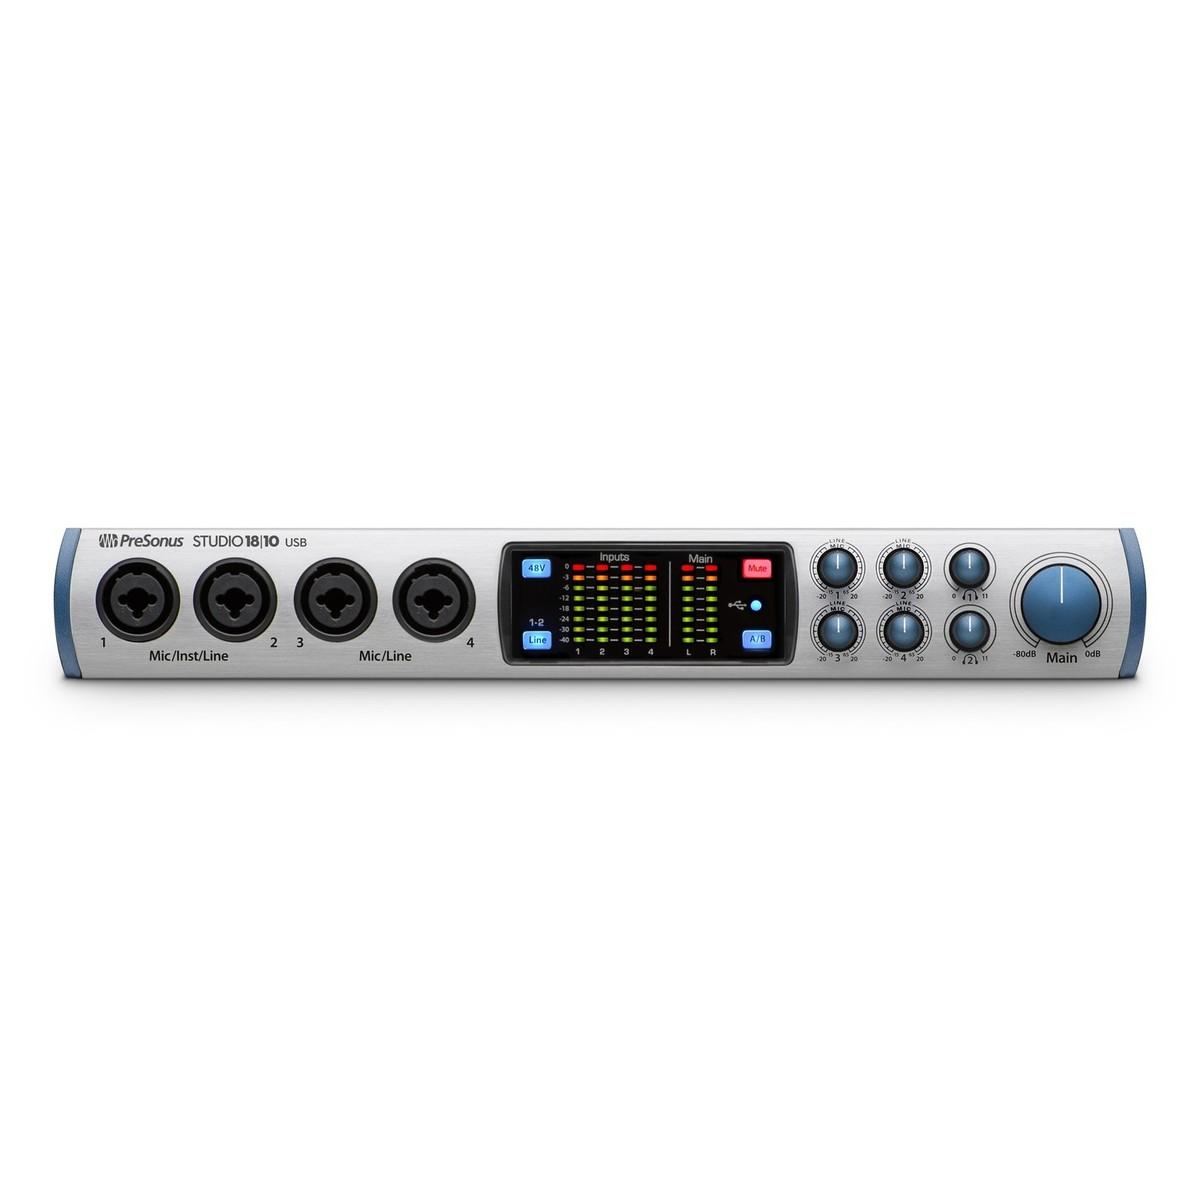 presonus studio 18 10 audio interface at. Black Bedroom Furniture Sets. Home Design Ideas